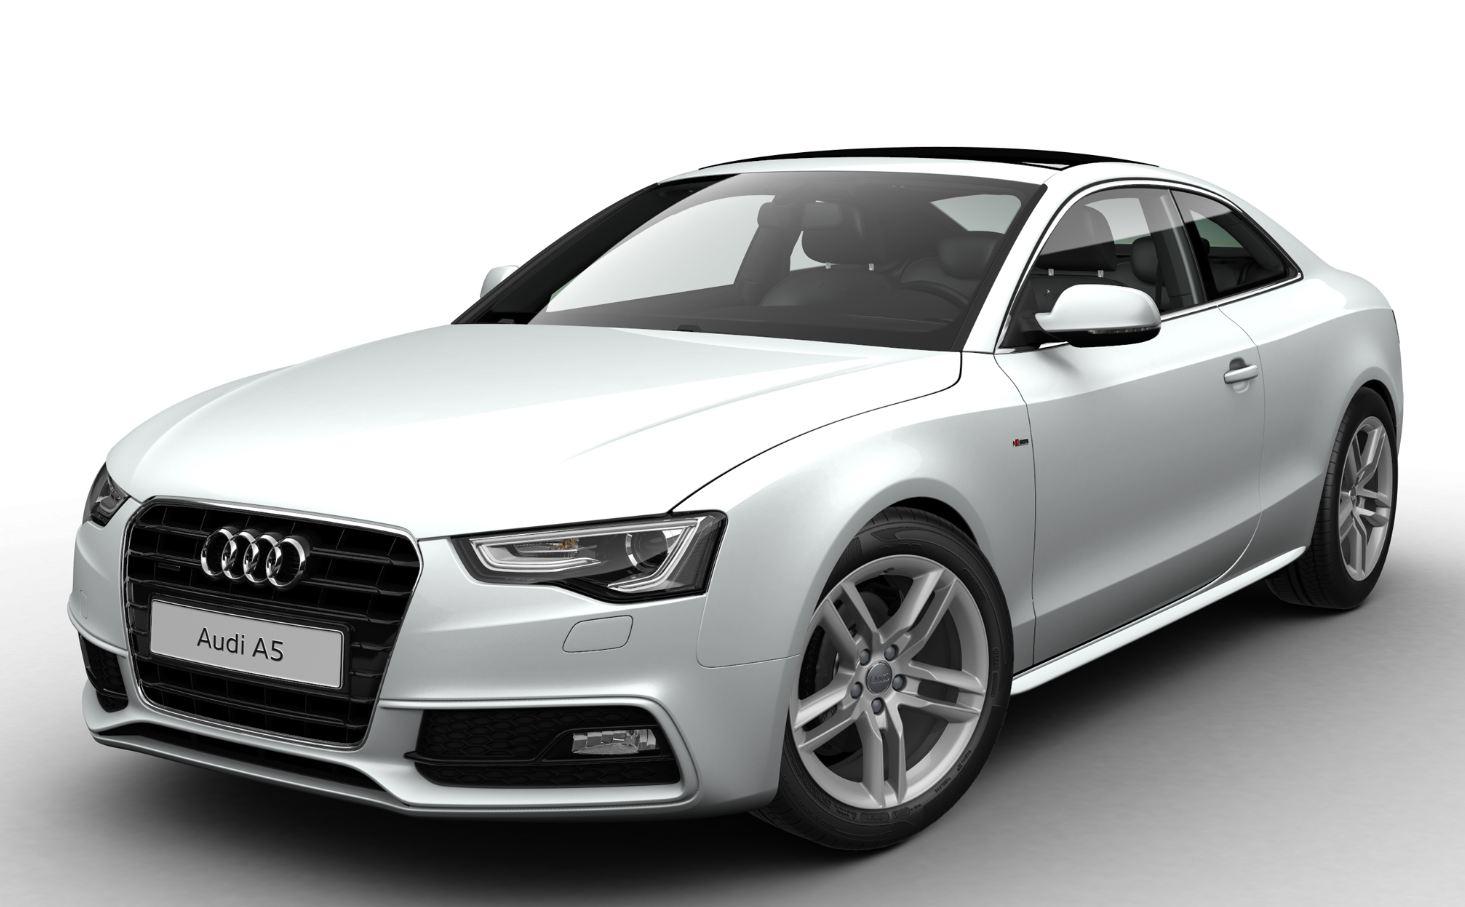 Nuevo Audi A5 Coupe S Line Edition